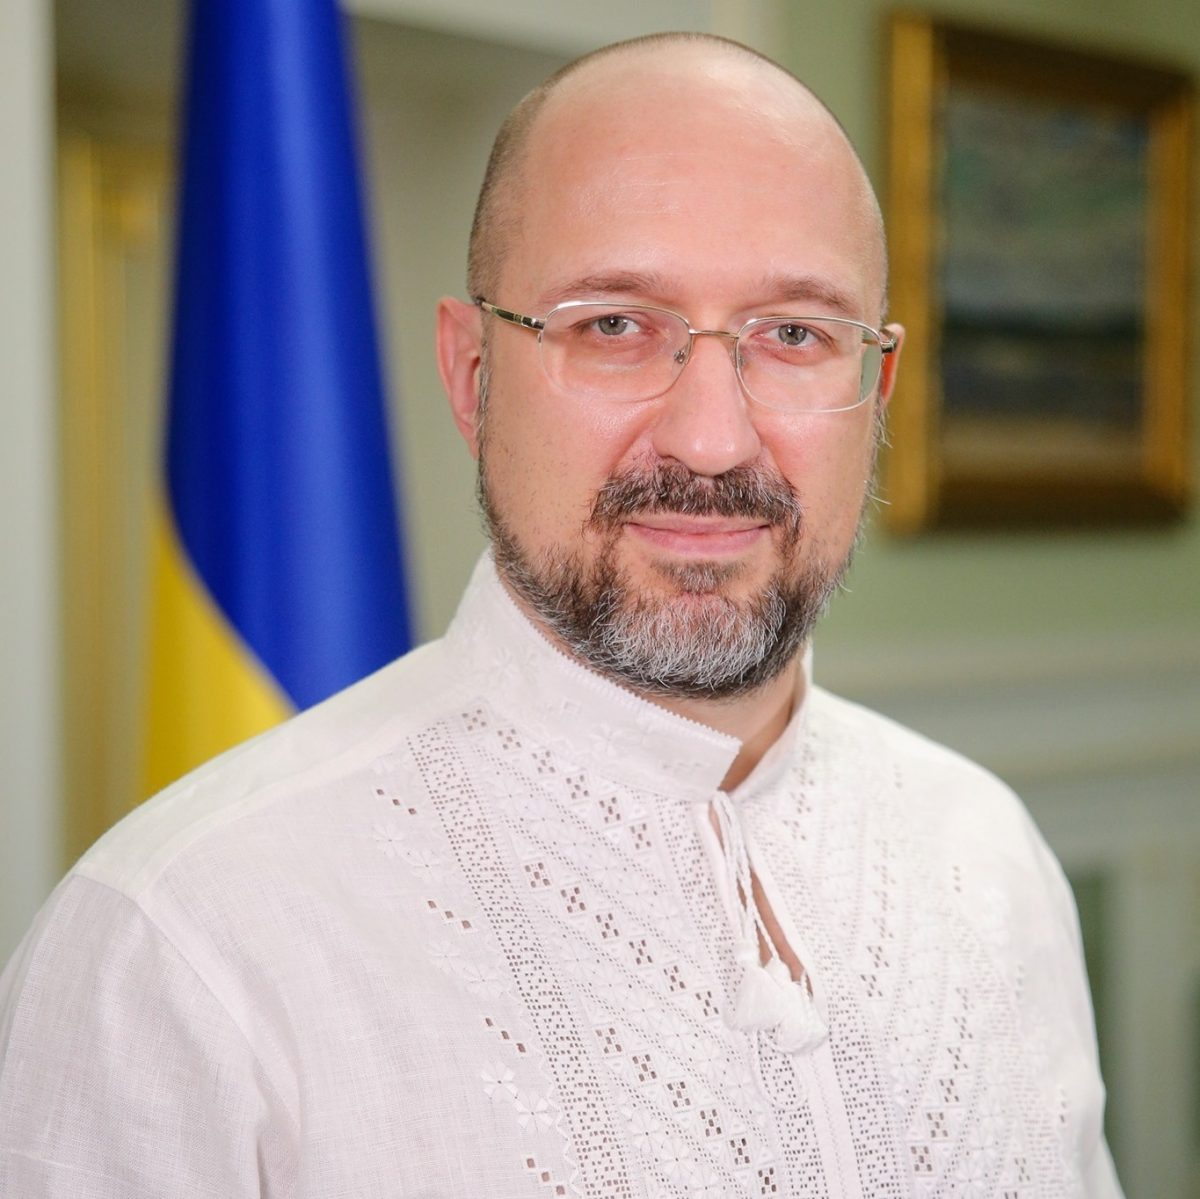 Прем`єр Шмигаль: КНР – найбільший торговельний партнер України; позитив у ВВП України